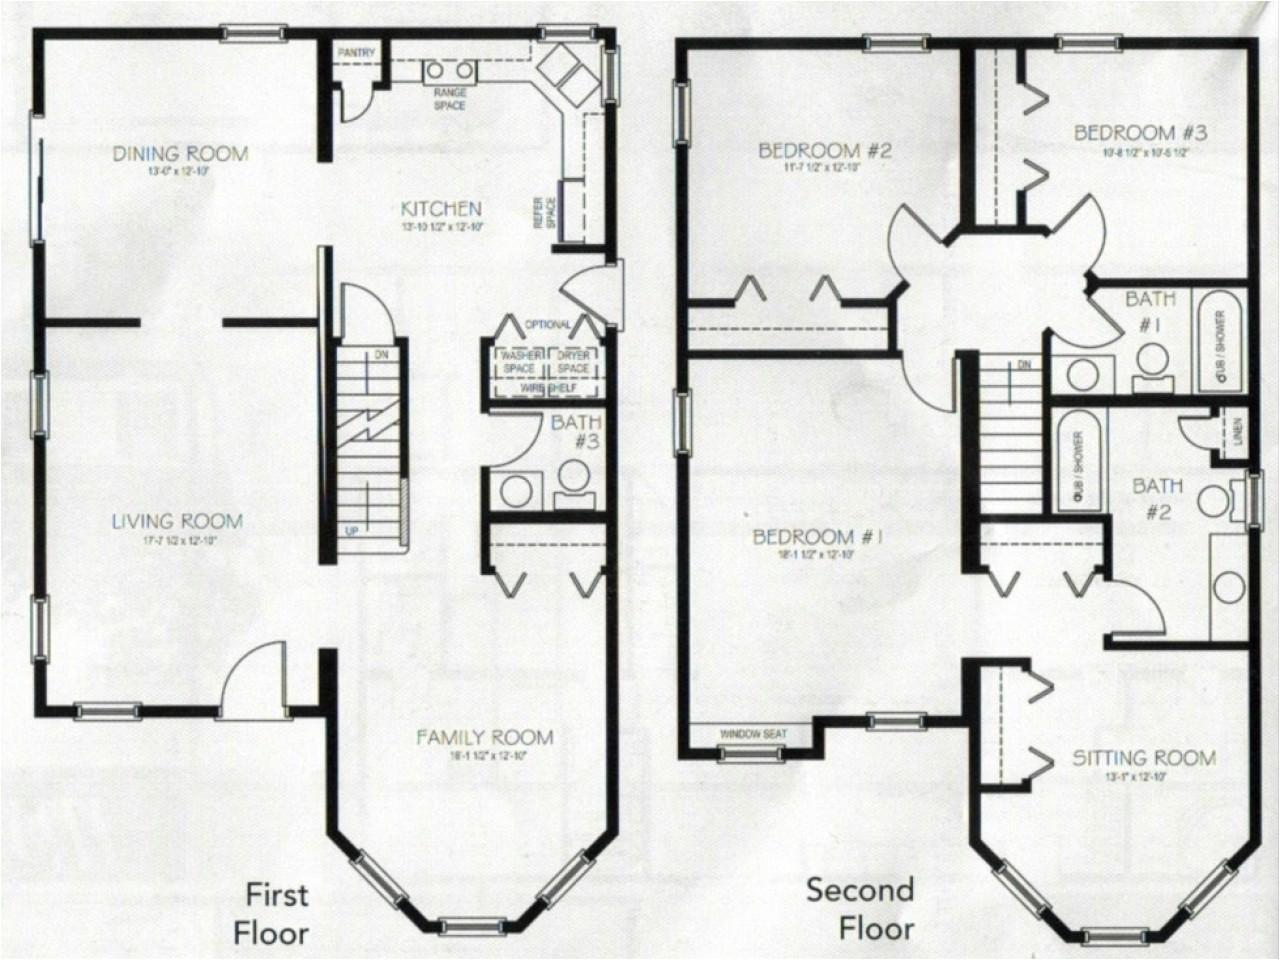 1c6e9d56762e4595 4 bedroom 2 story house plans 2 story master bedroom